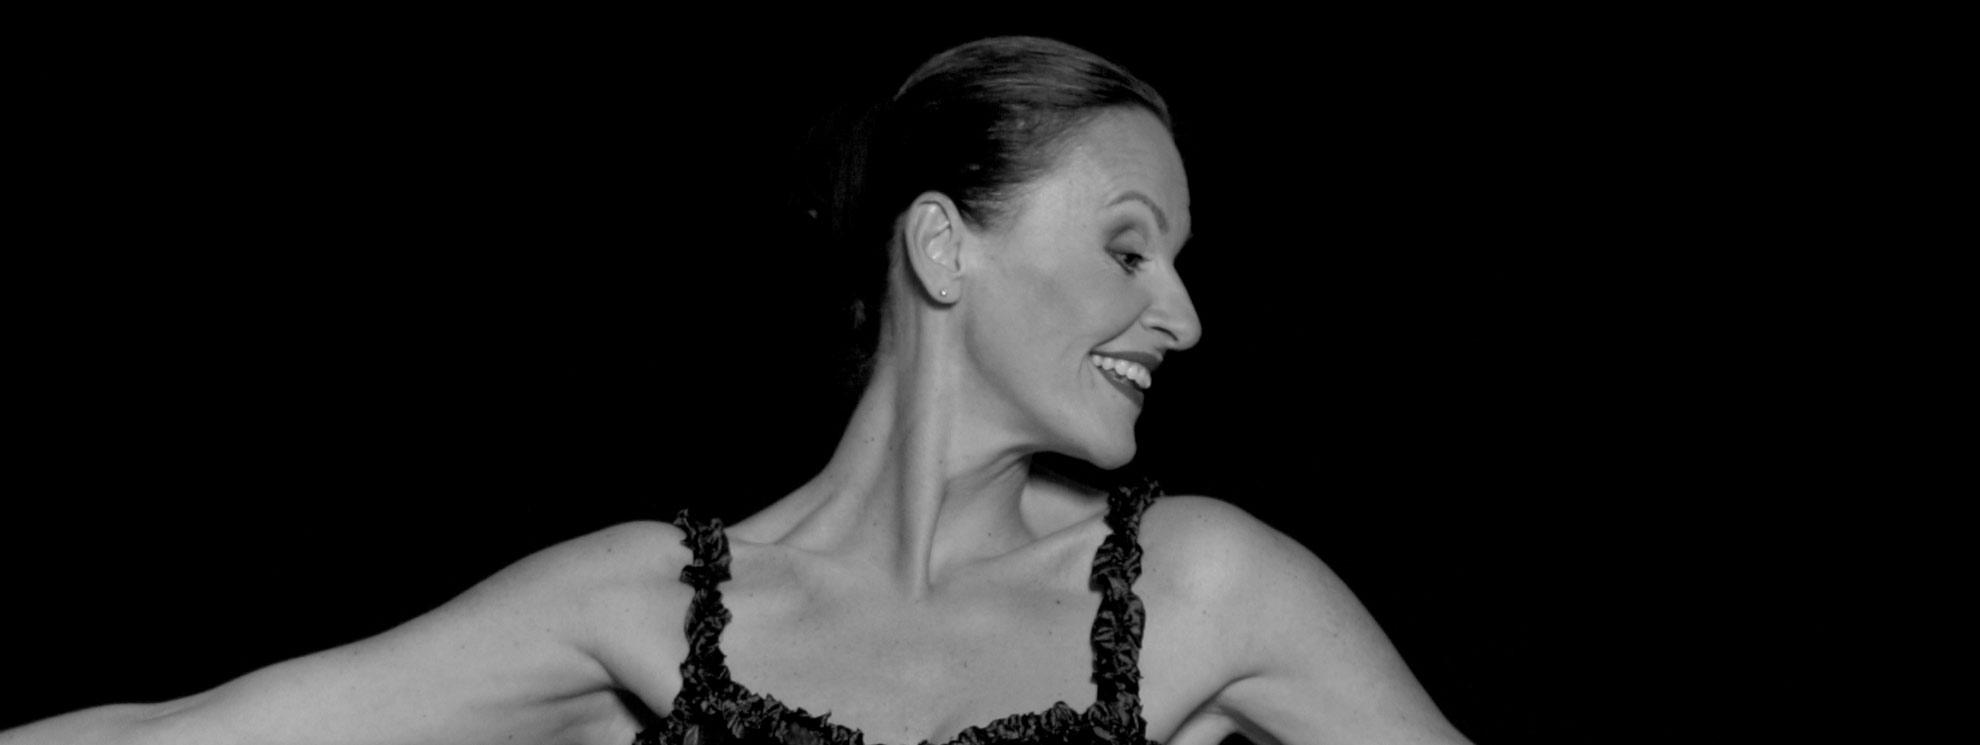 Bettina Habekost | Tanz - Choreographie - Performance